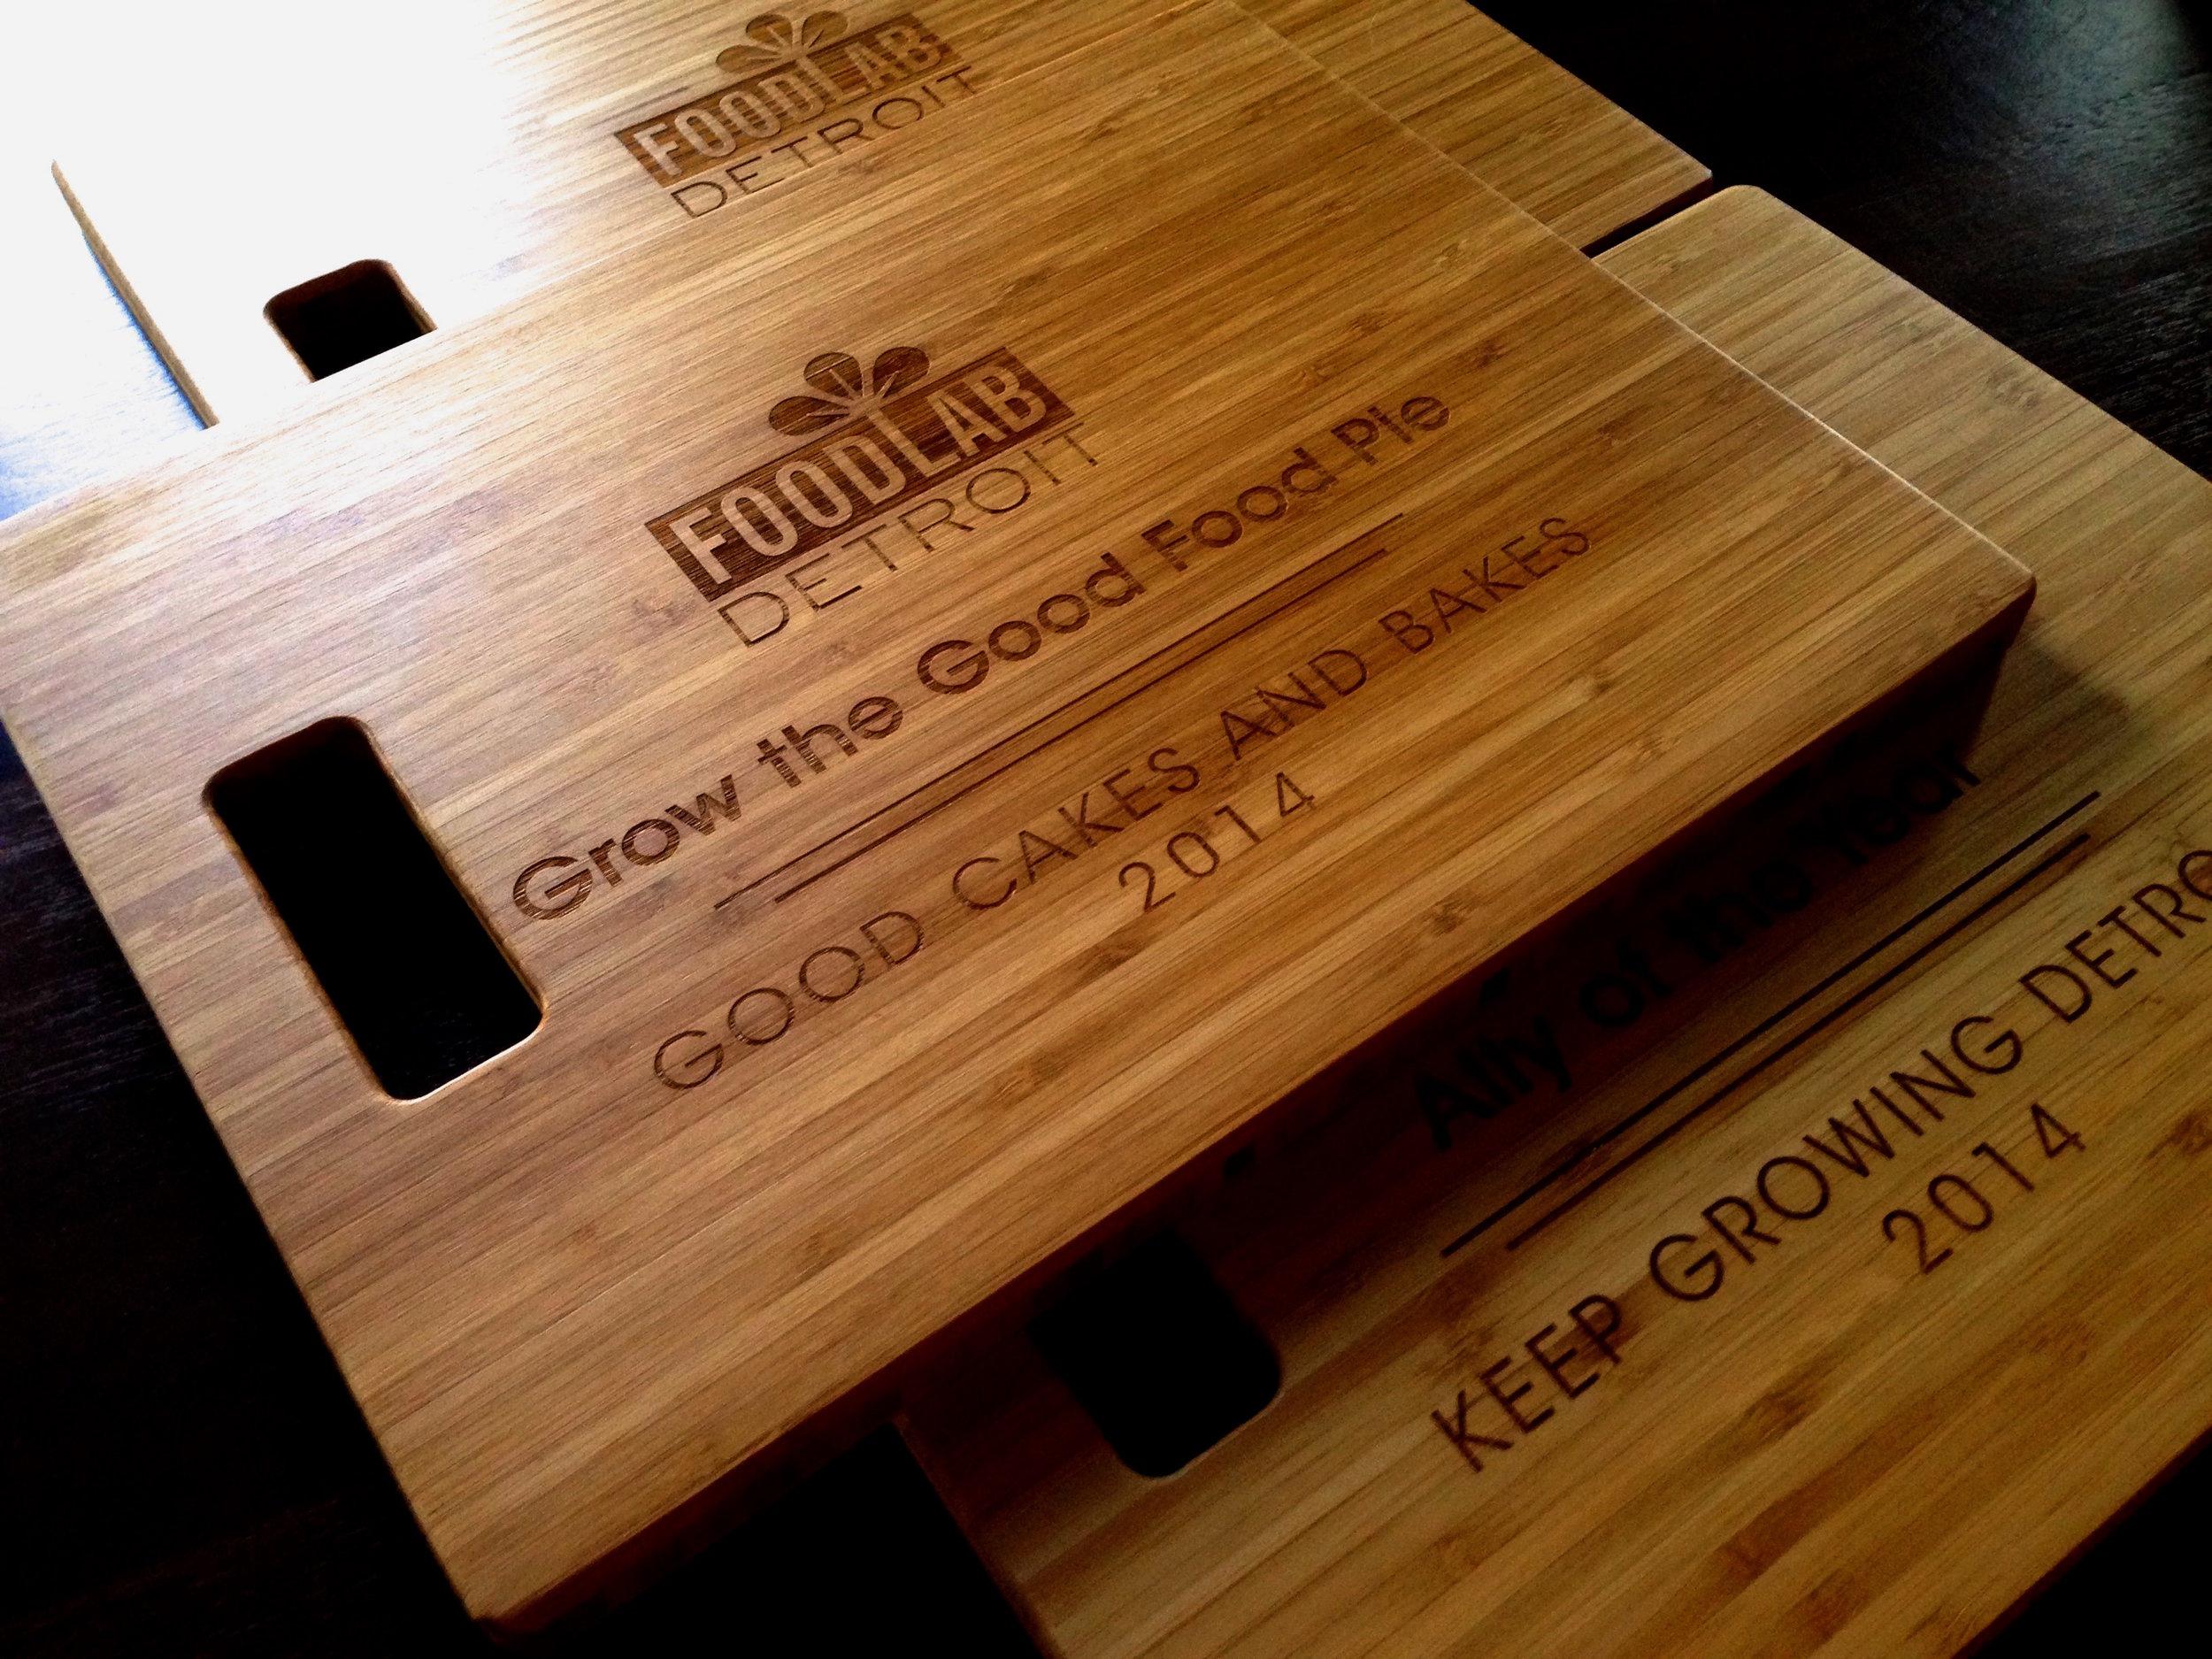 10 Virginia Personalized Cutting Boards Custom Engraved Corporate Logo Company Customer Appreciation Employee Performance Loyalty Award Gift